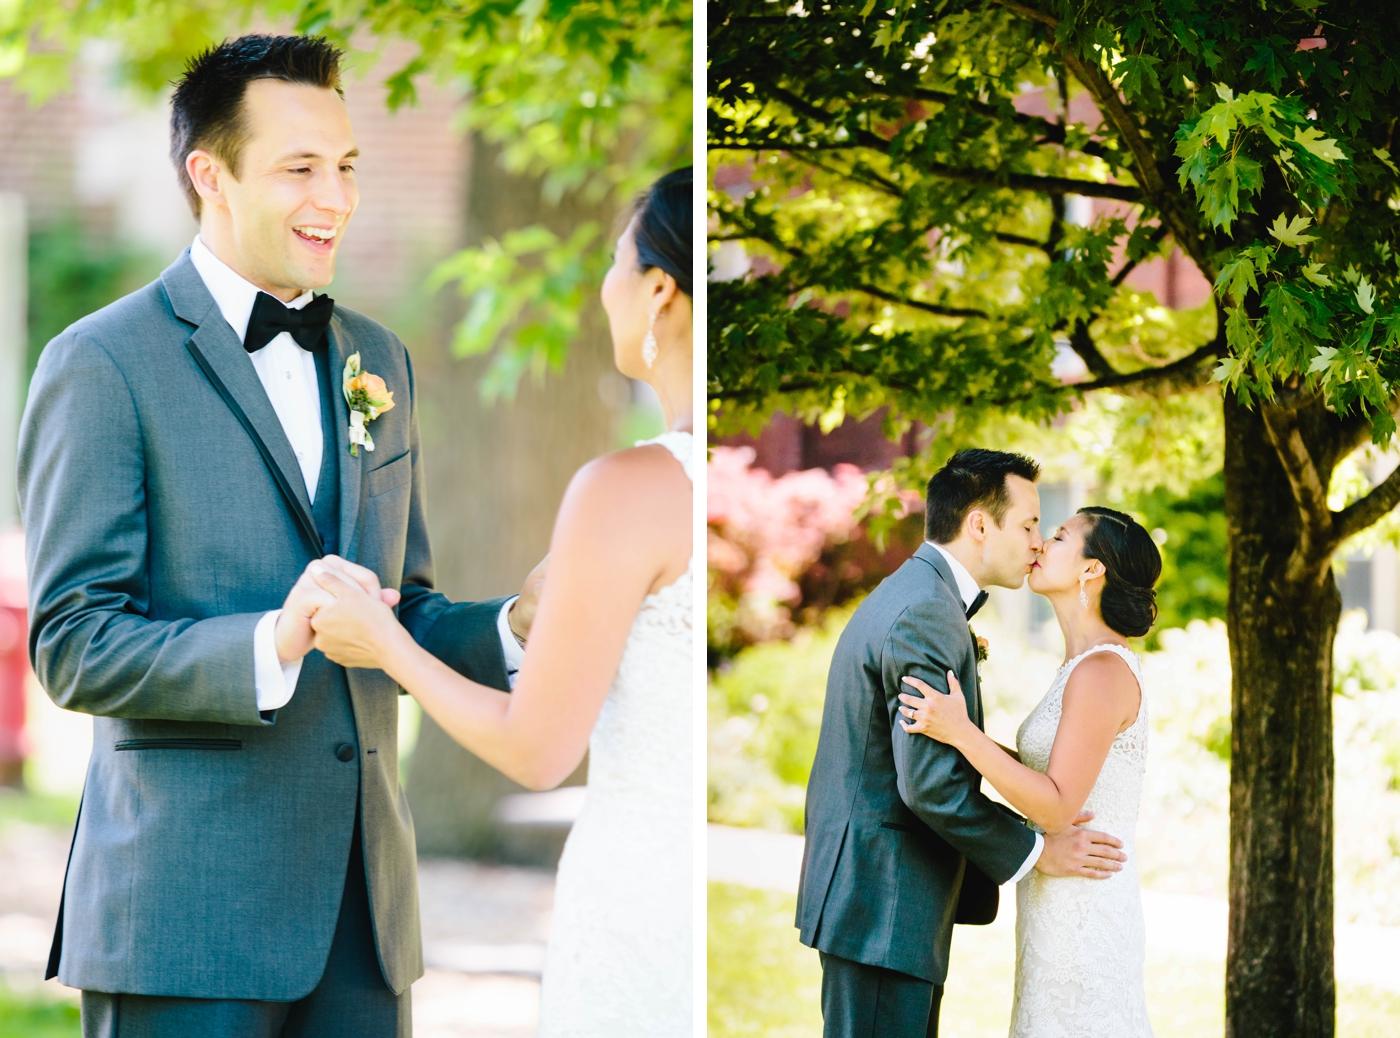 chicago-fine-art-wedding-photography-honey22